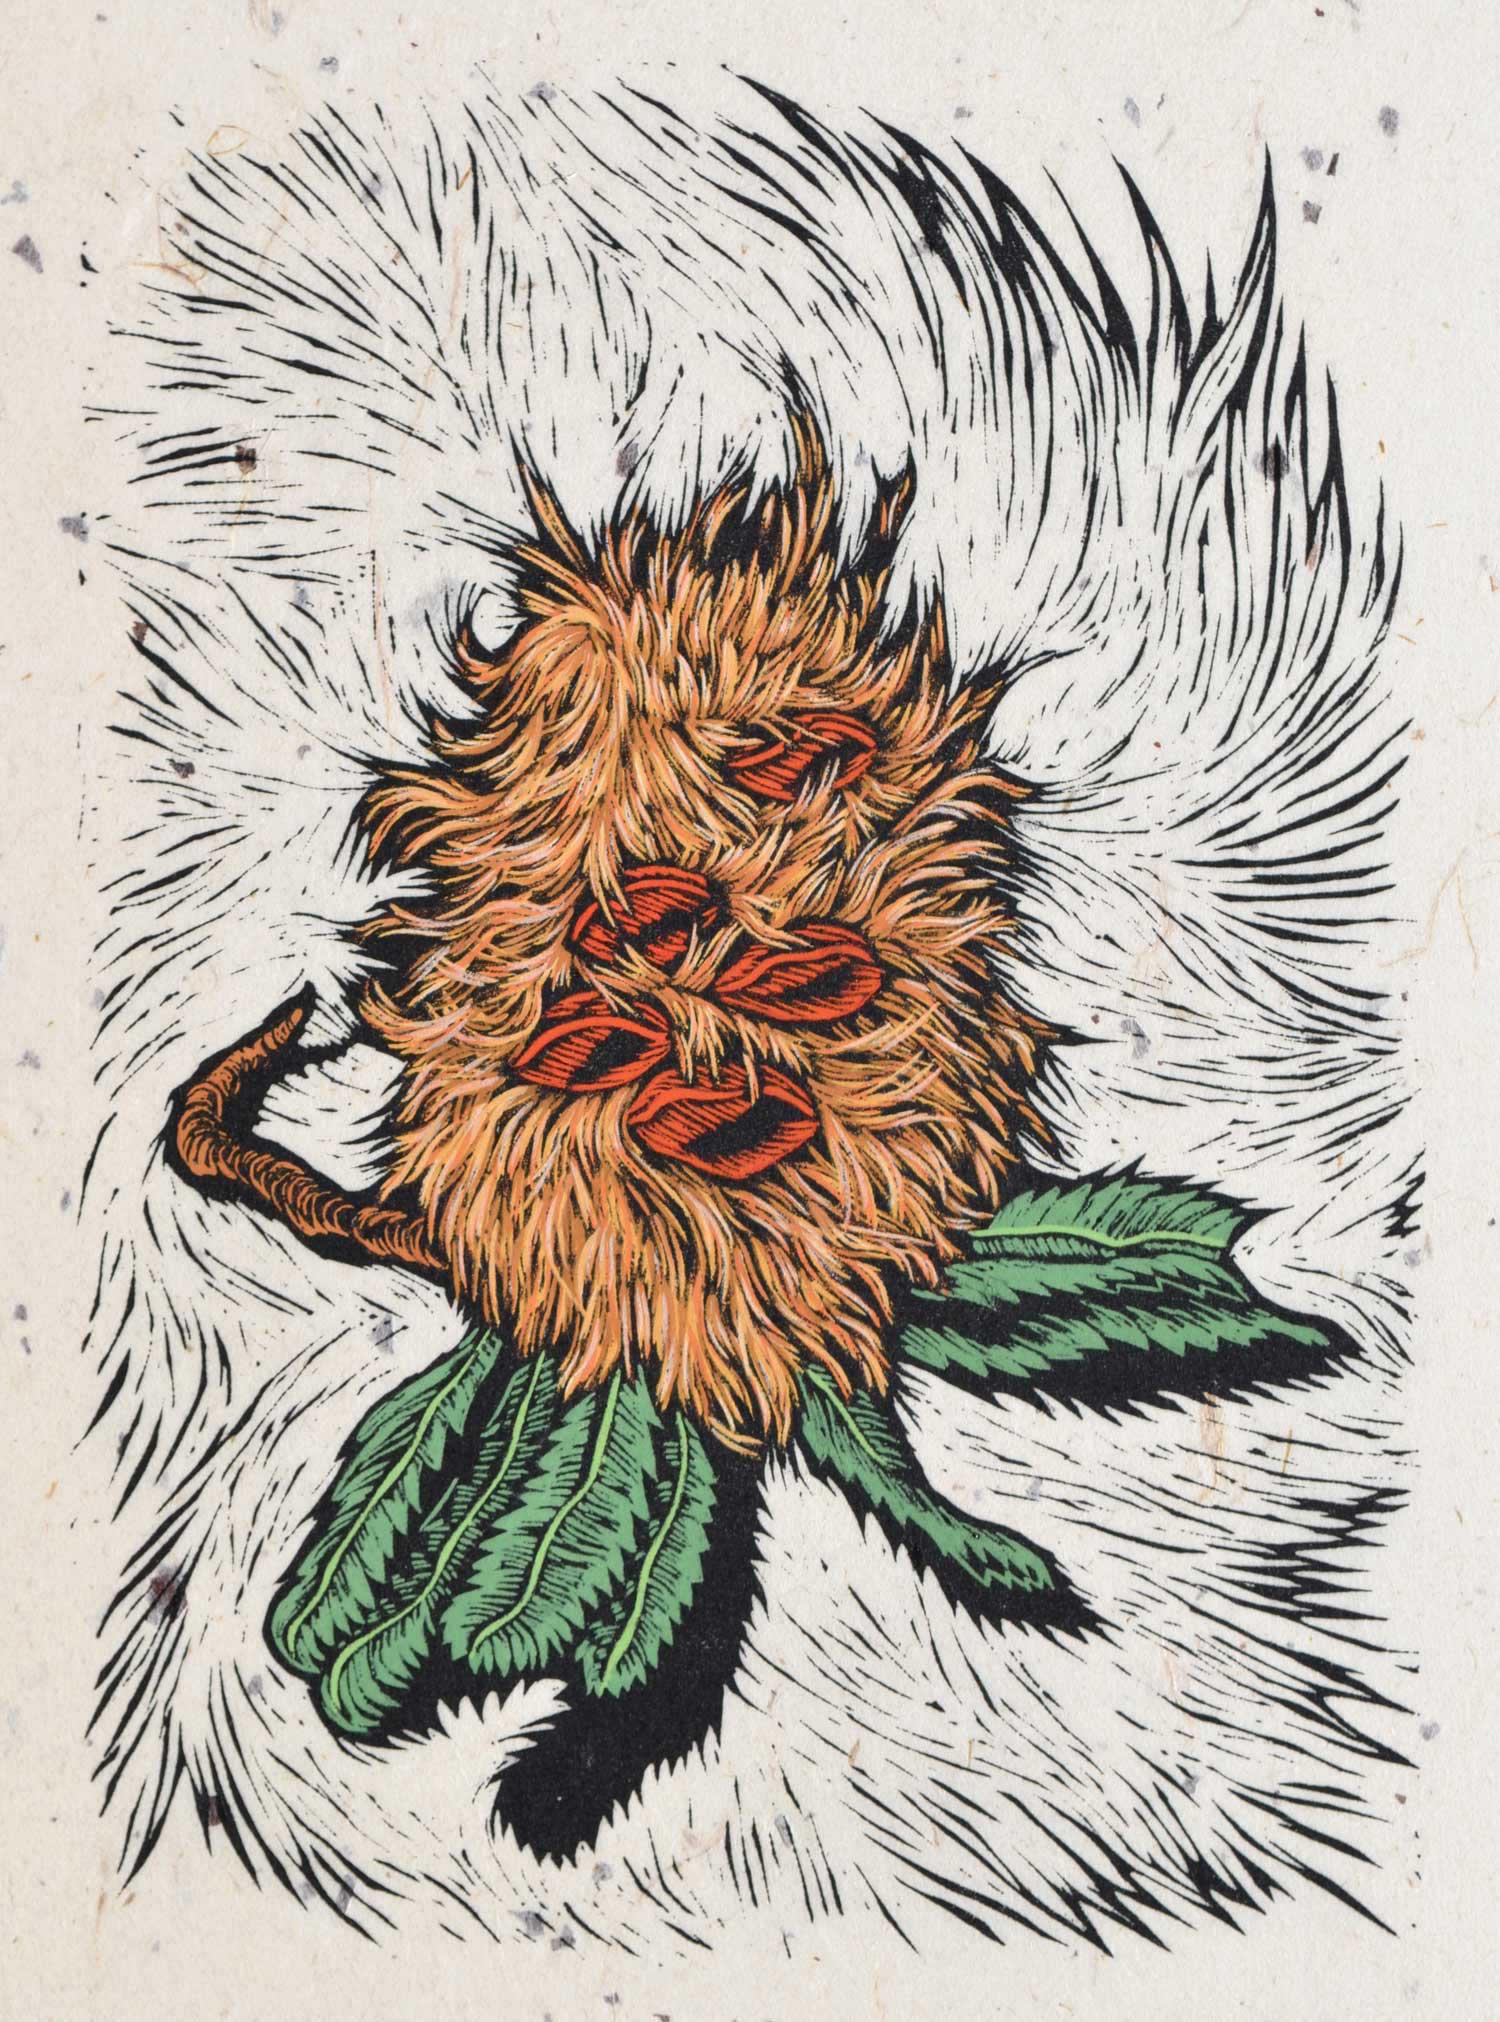 Banksia Man  41 x 29 cm Edition of 50  Hand Coloured Linocut on handmade Japanese paper  $850